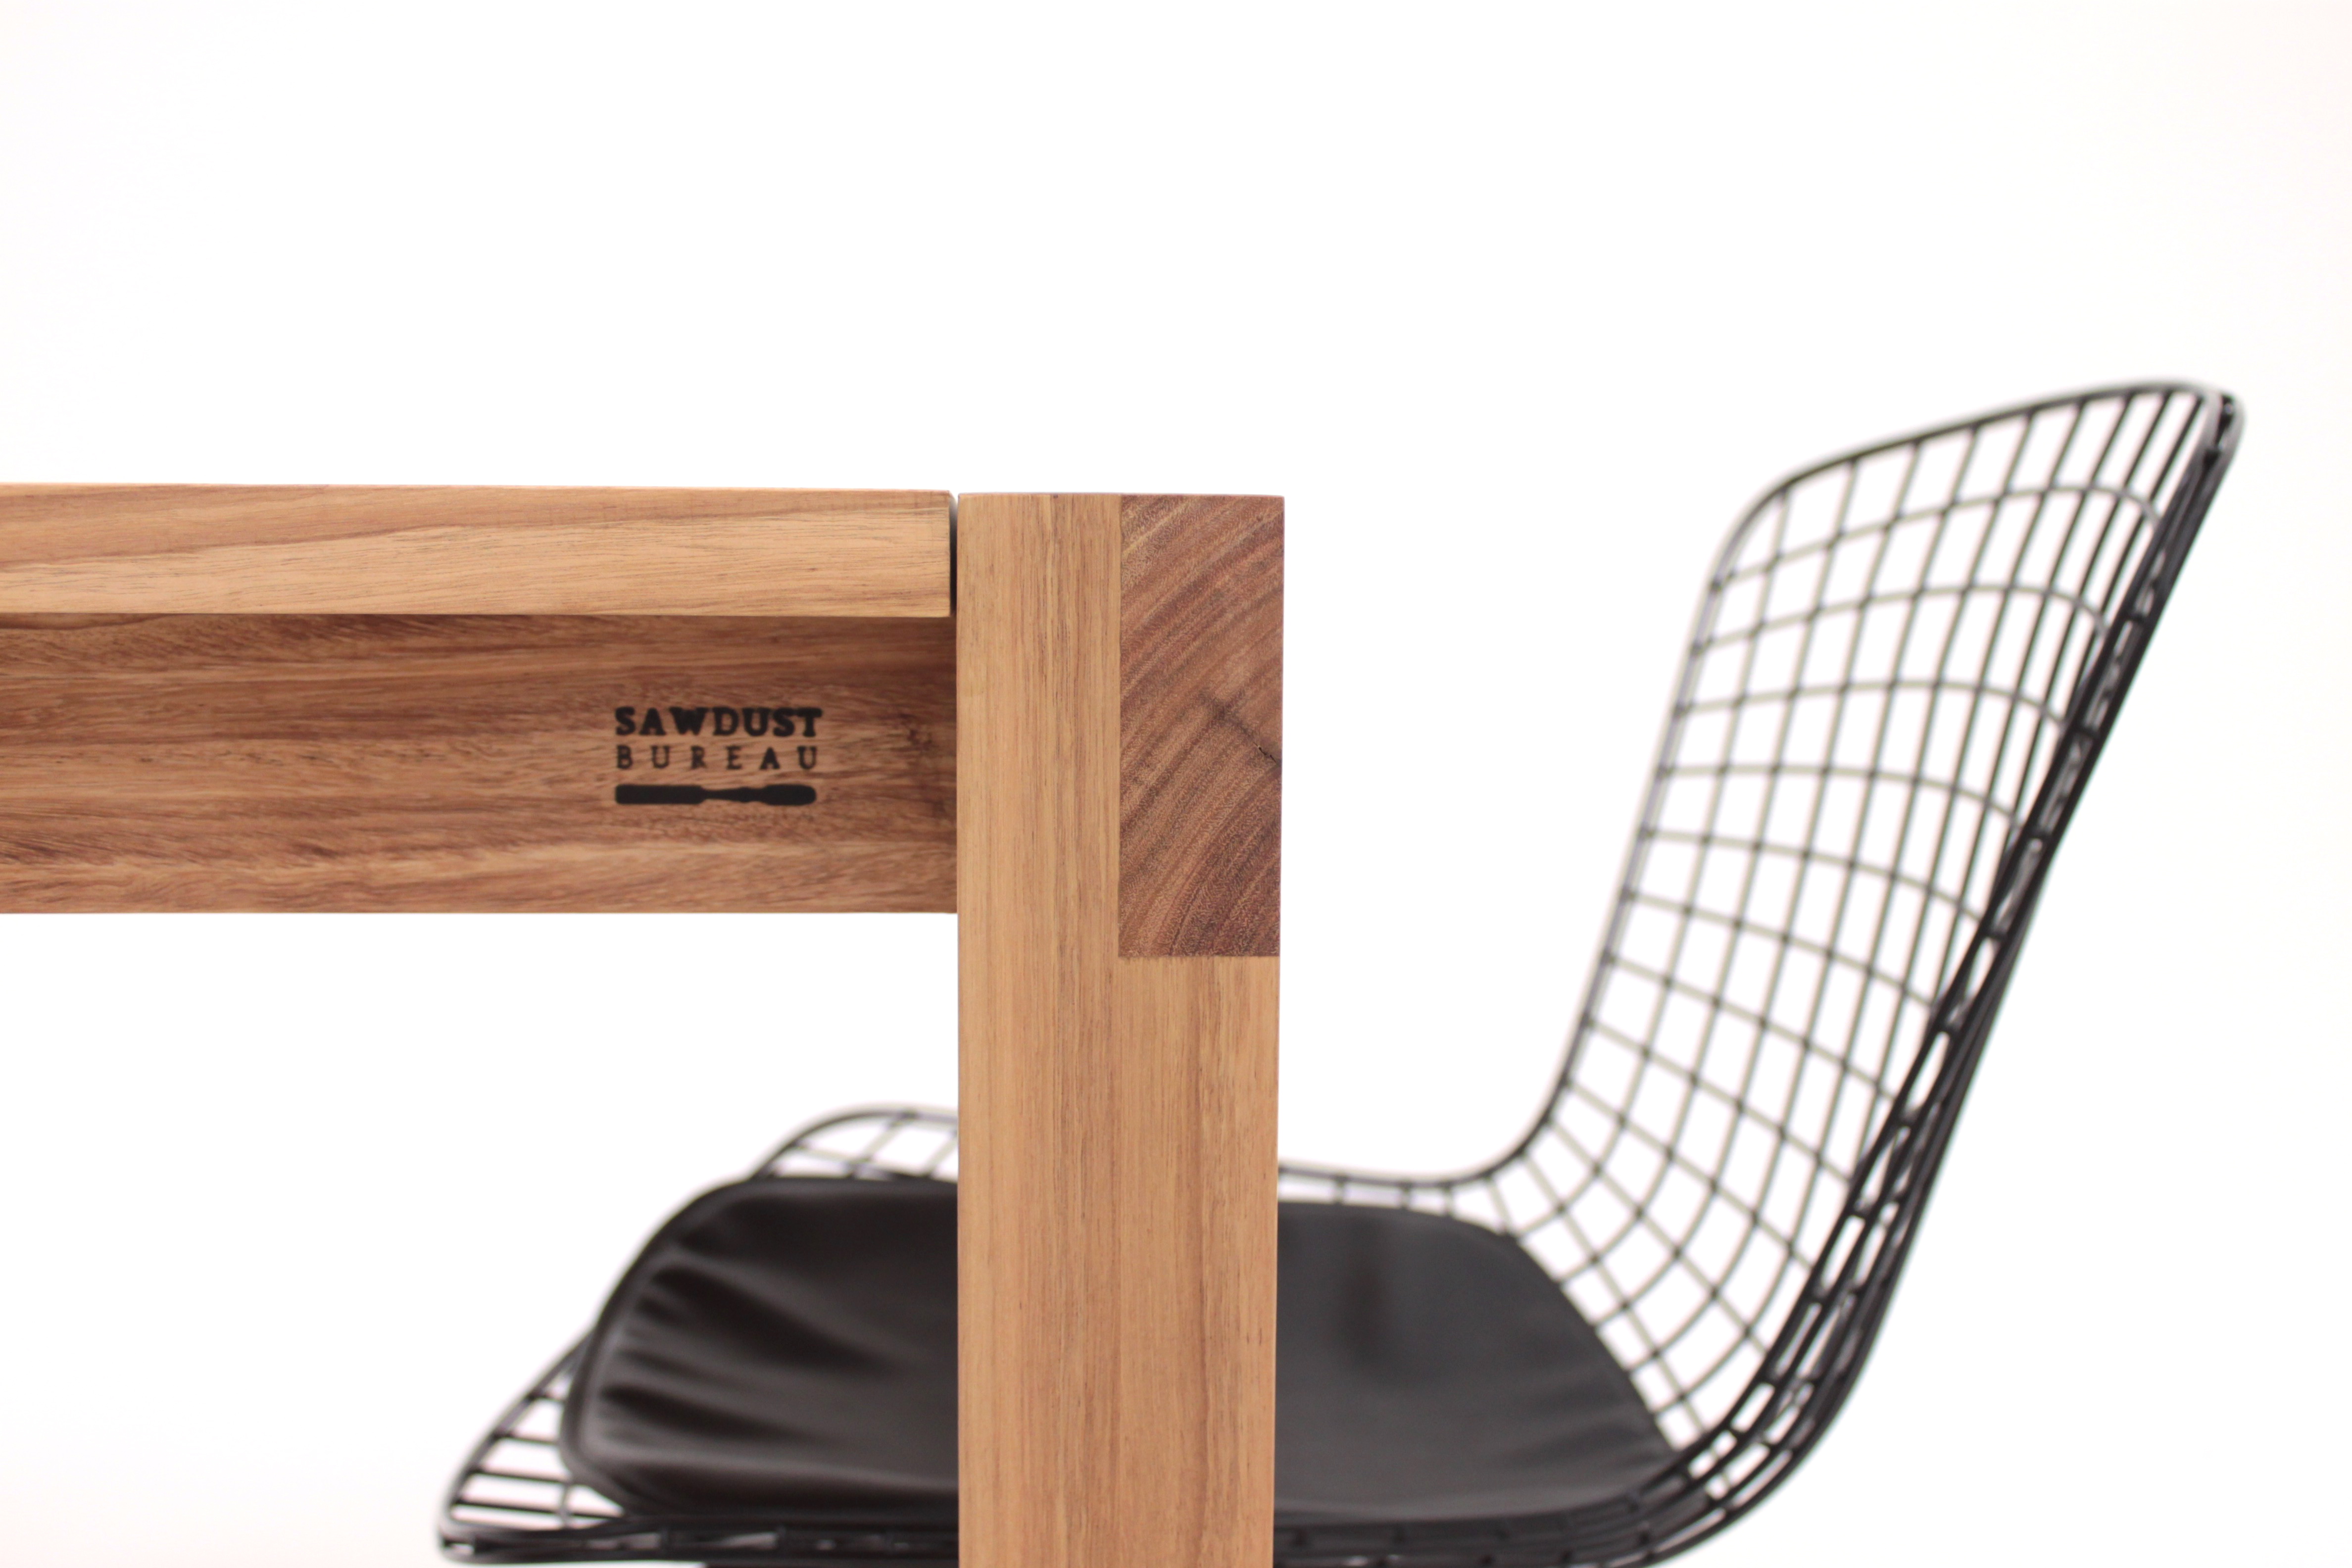 Torrini Table by Sawdust Bureau 06